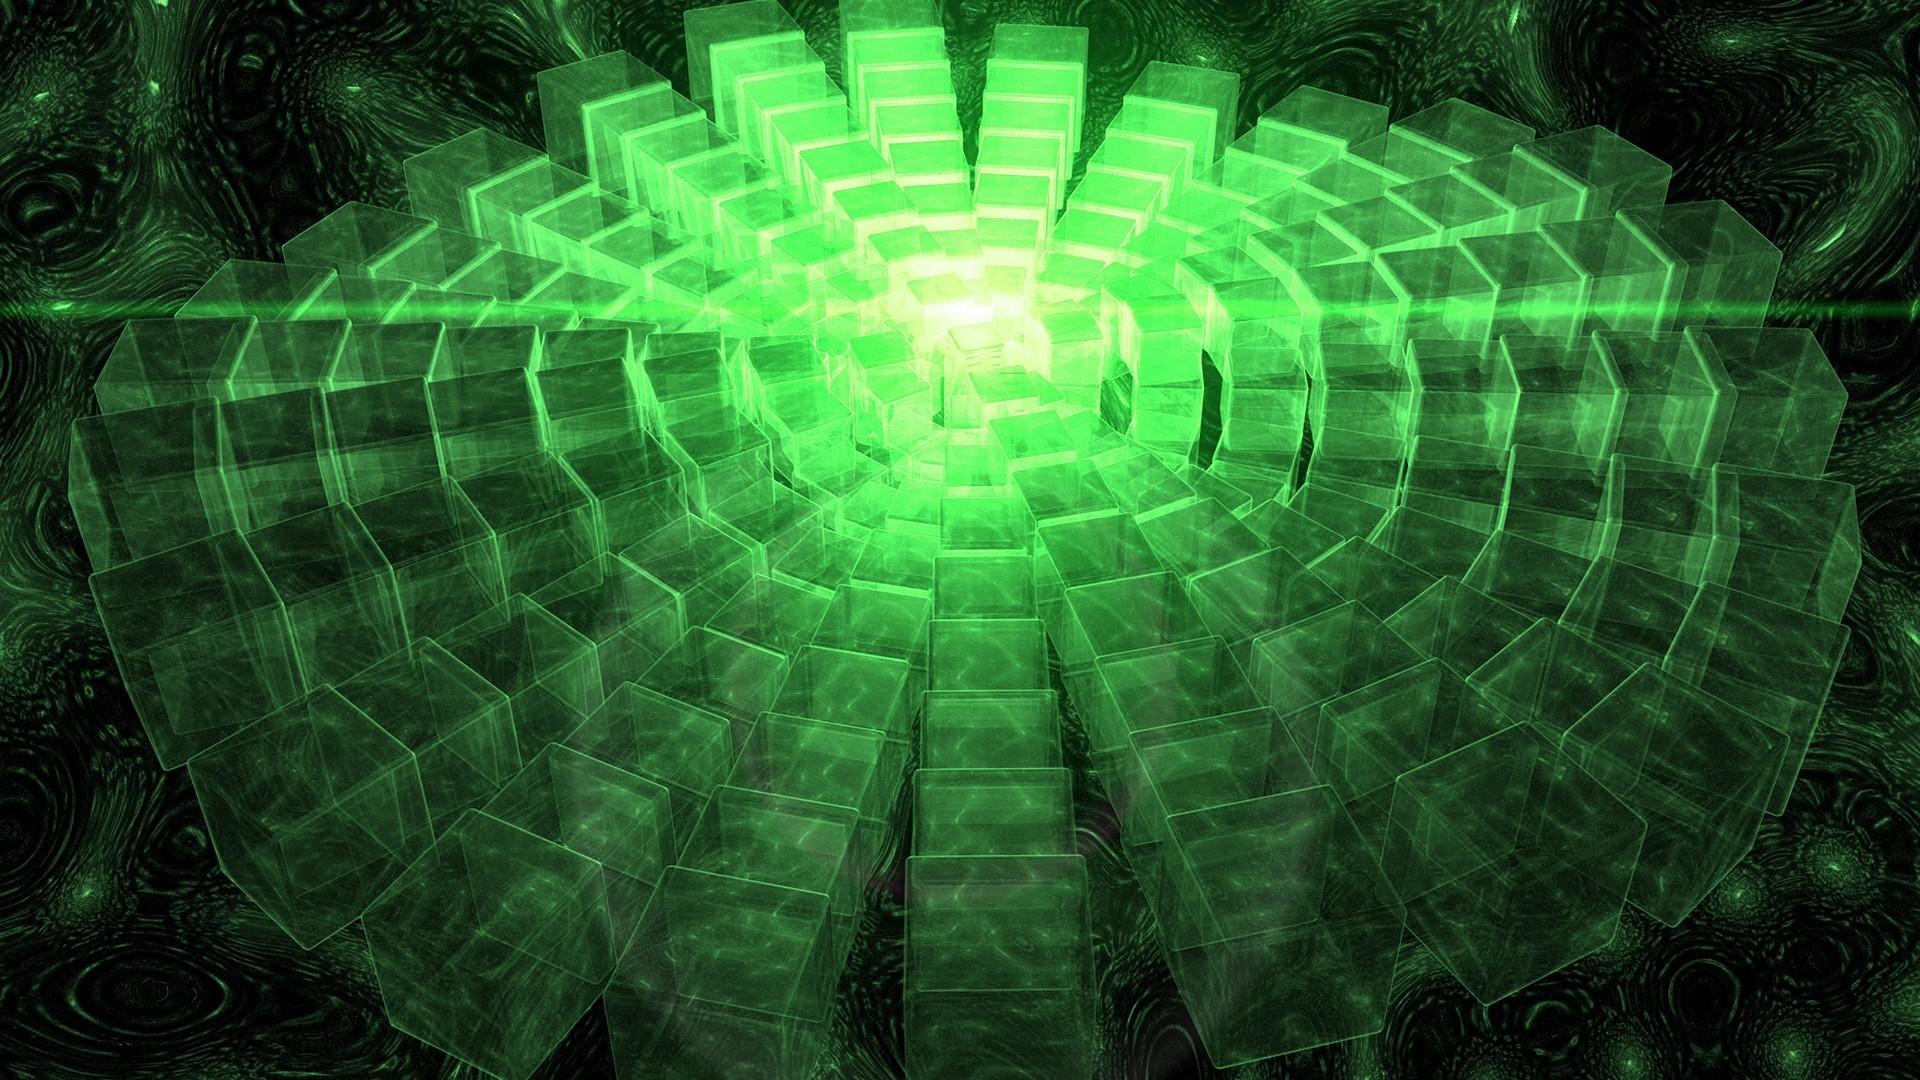 Res: 1920x1080, Abstract outer space CGI cubes digital art glow 3D art wallpaper |   | 200741 | WallpaperUP